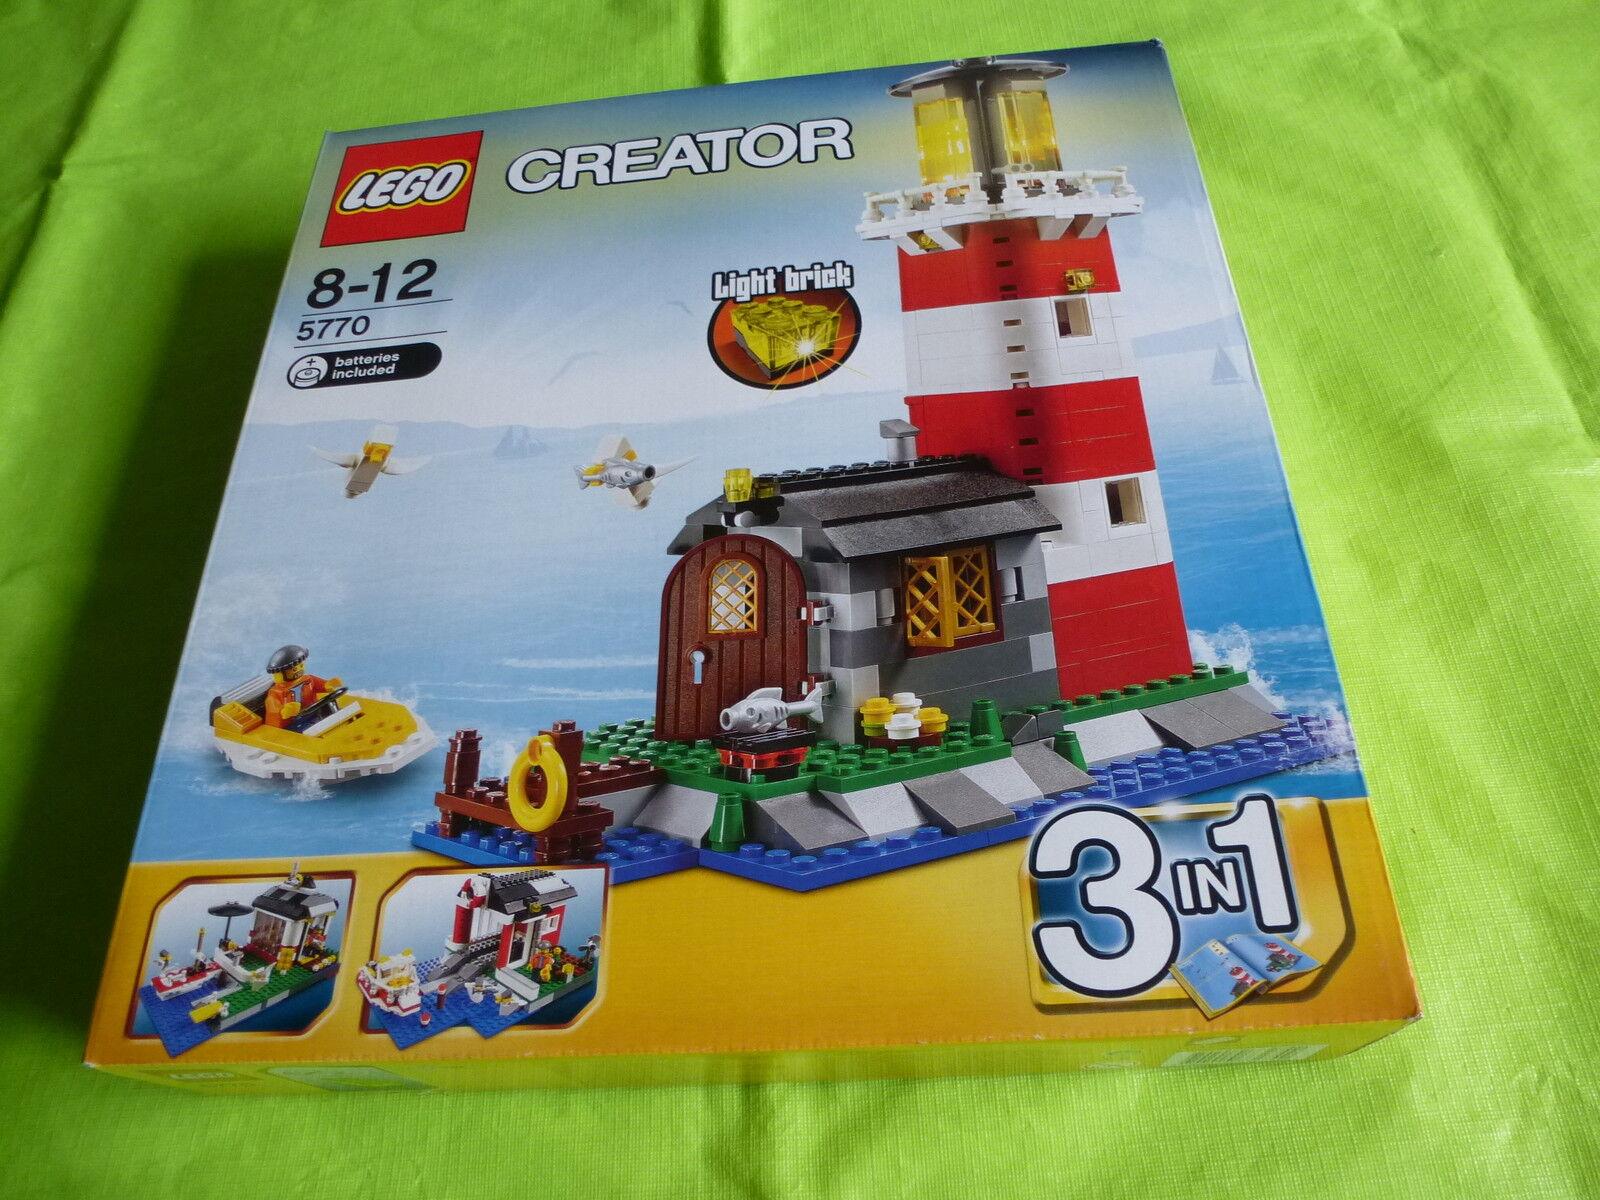 LEGO NEW 5770  2 Creator Lighthouse Sealed Box 2011 518 pieces  Now RetiROT